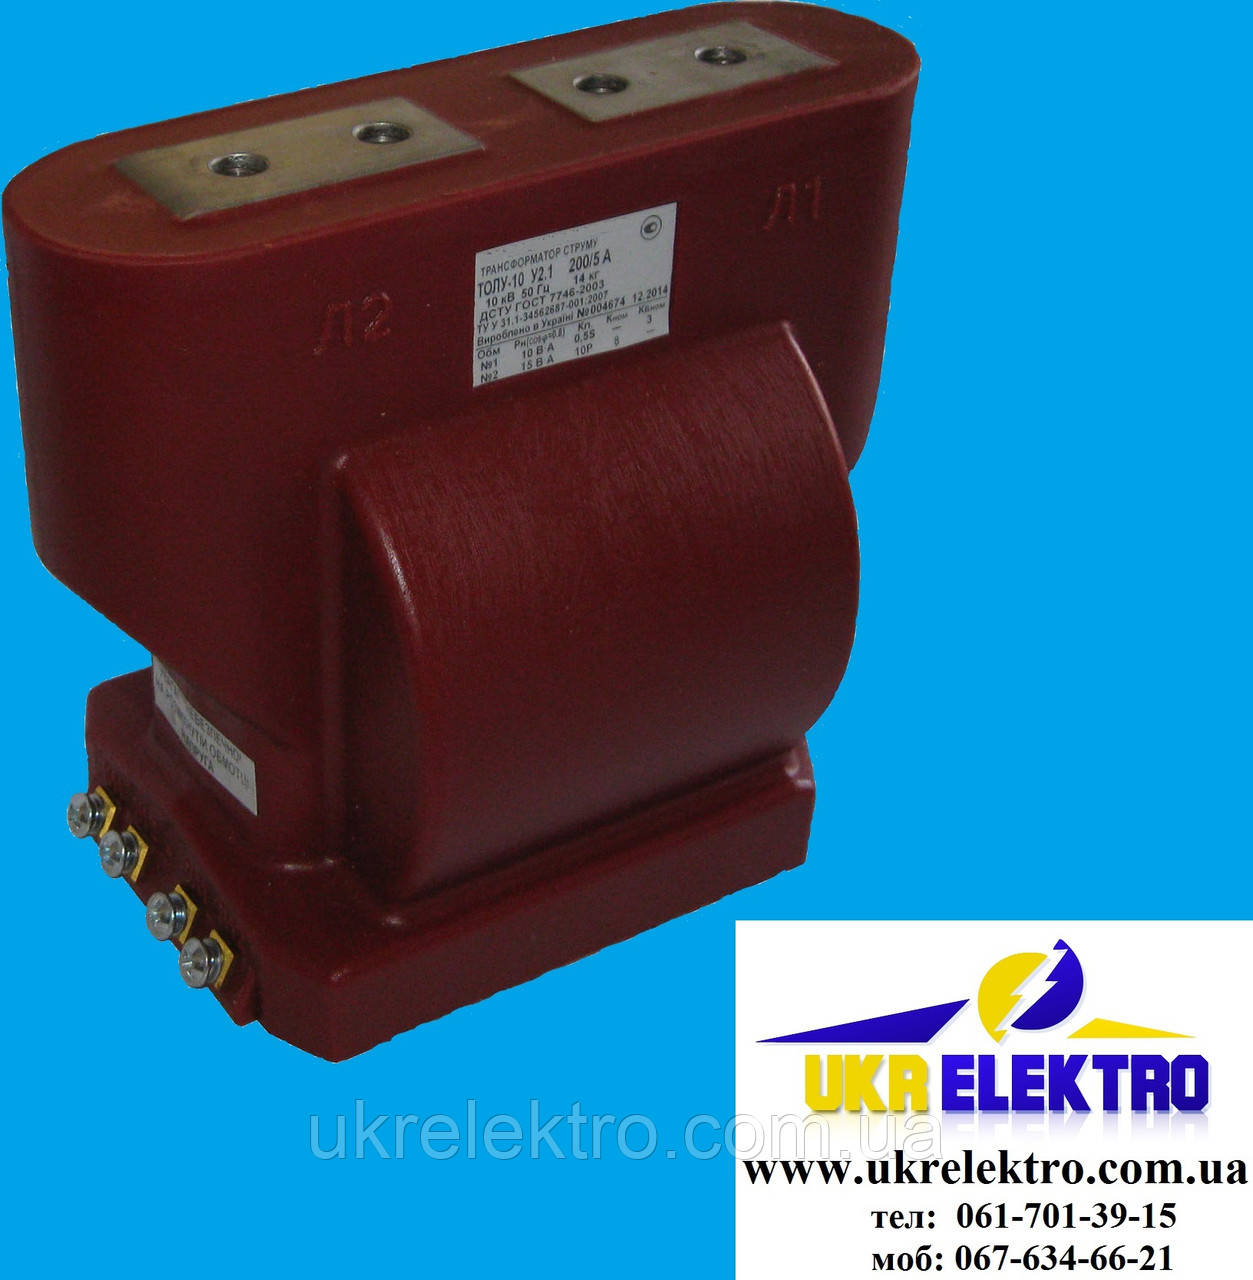 Трансформатор тока ТОЛУ-10 20/5 0,5s